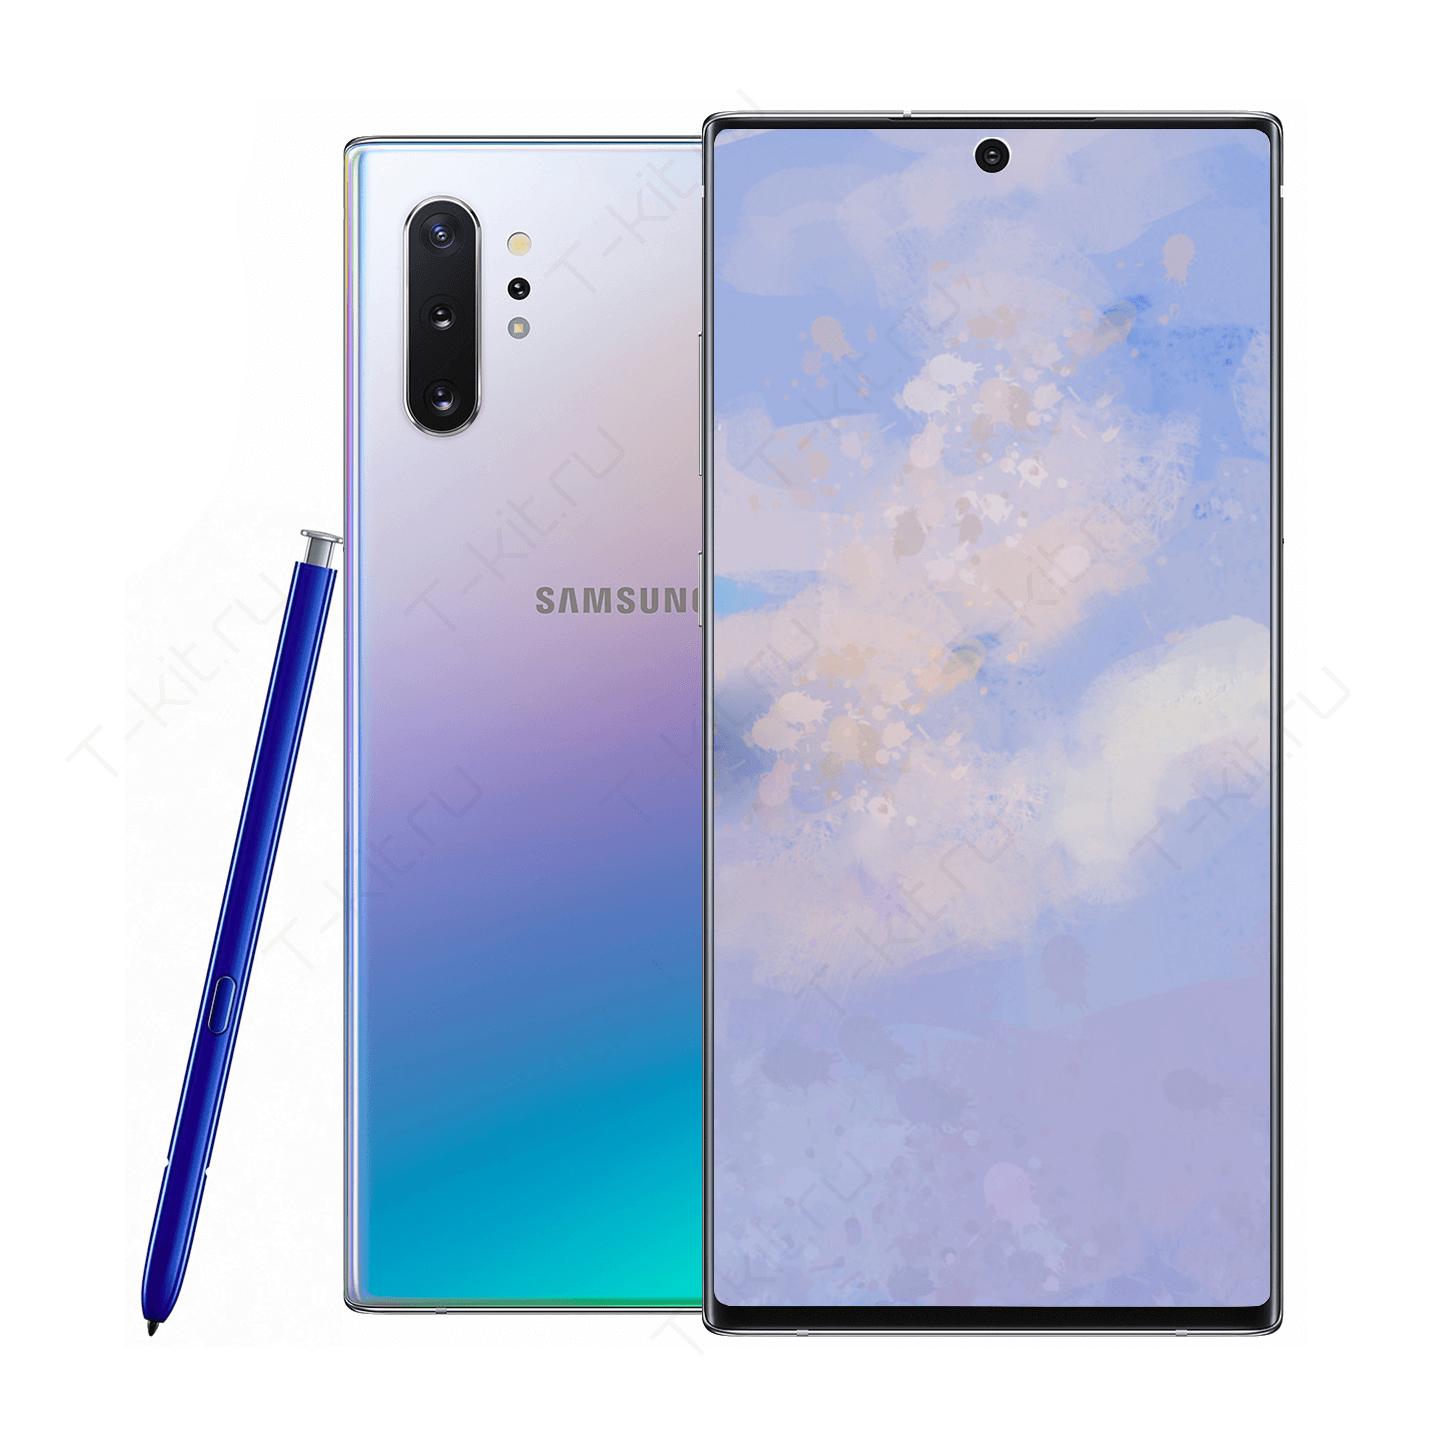 Samsung Galaxy Note 10+ Plus Glow